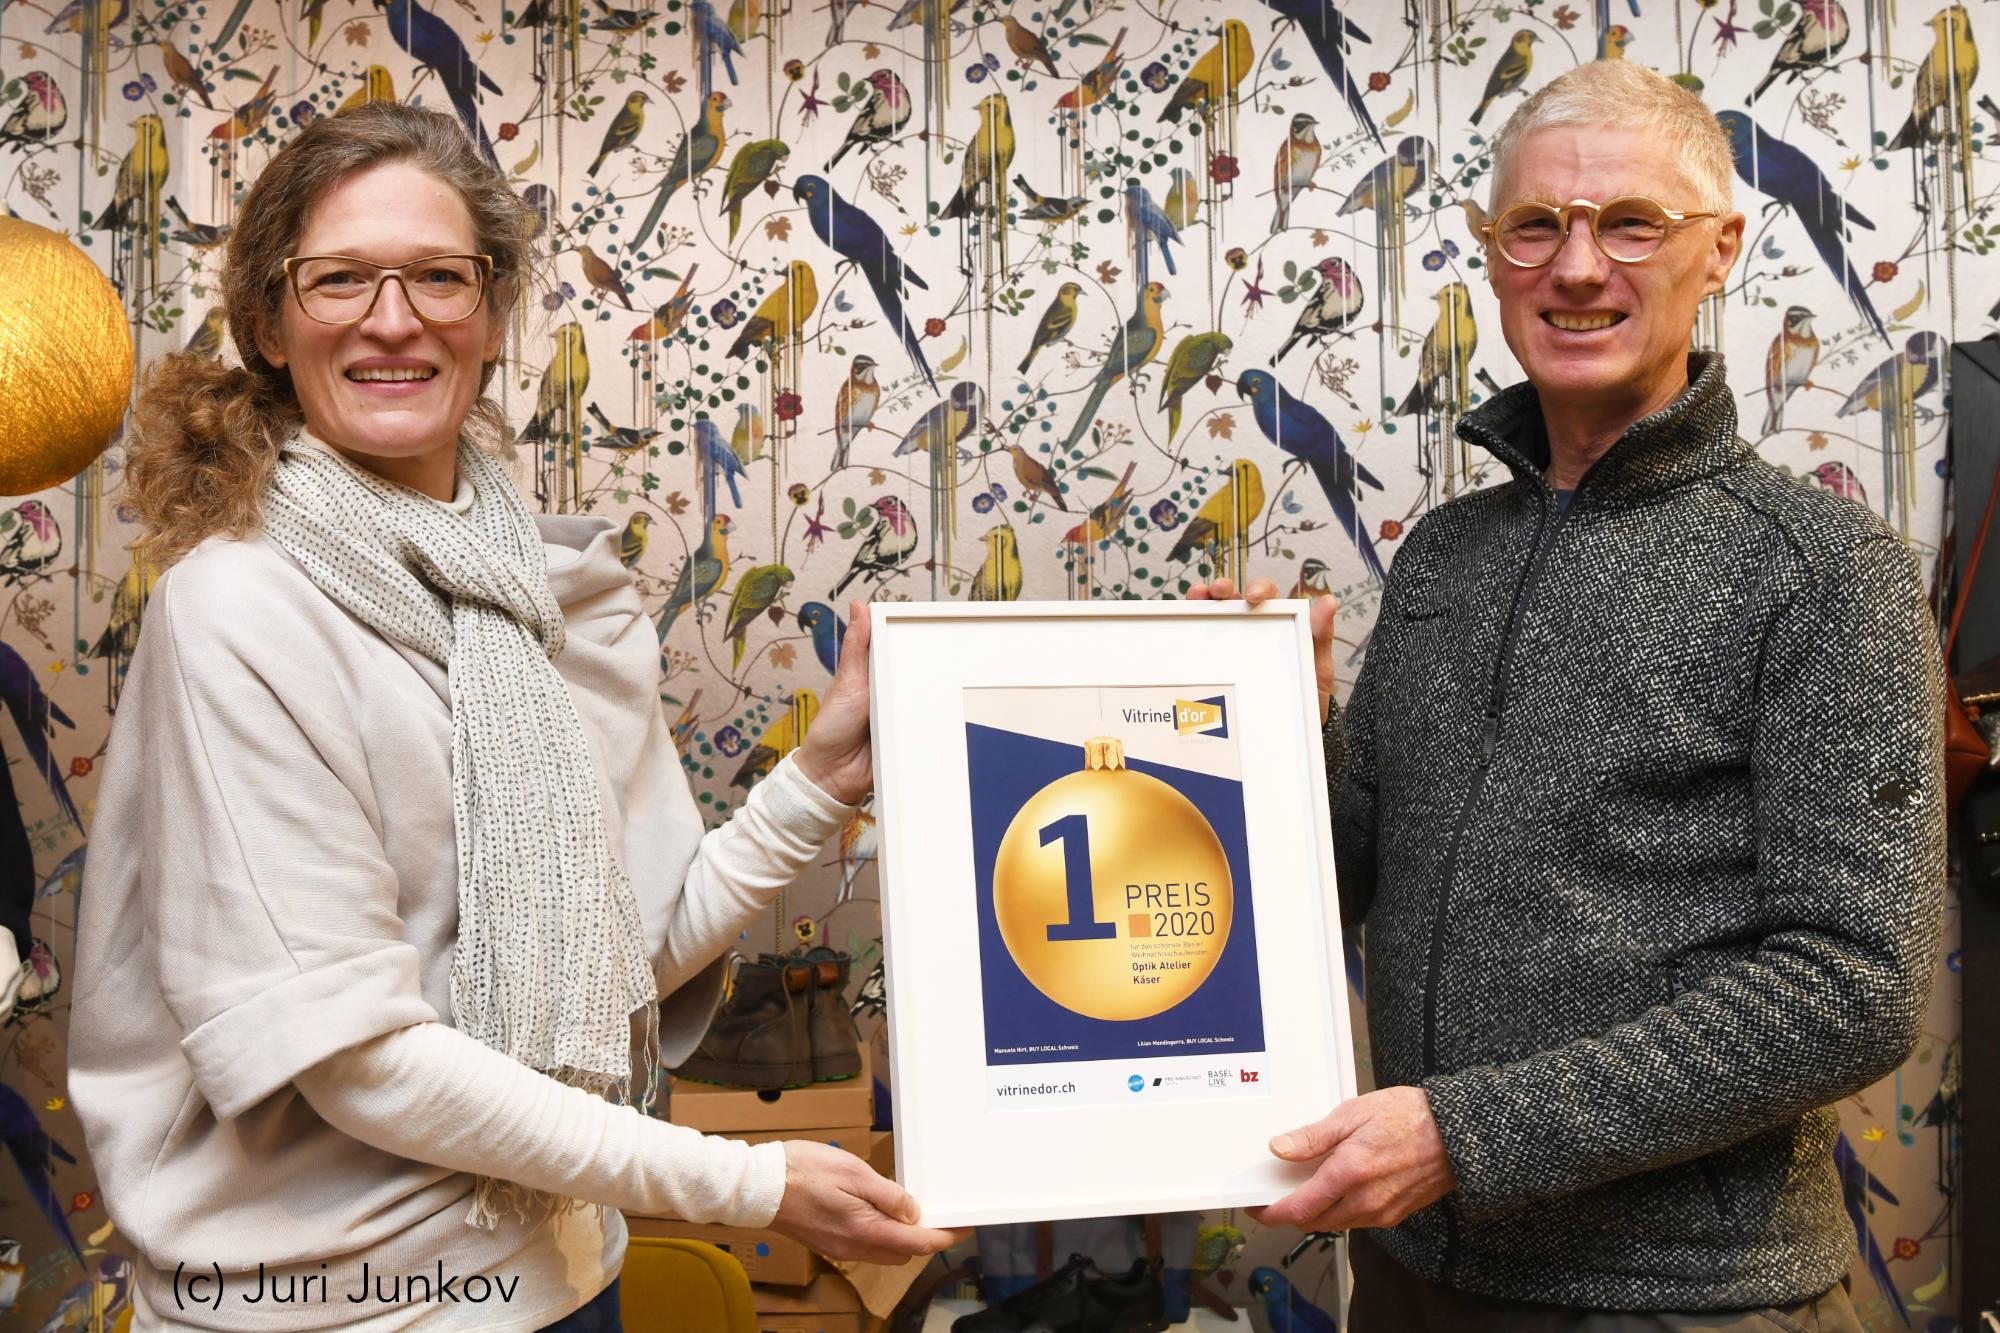 Schaufenster Nr. 074: Vitrine d'Or, Preisverleihung der bz vom 15. Januar 2021 (Photo: Juri Junkov)